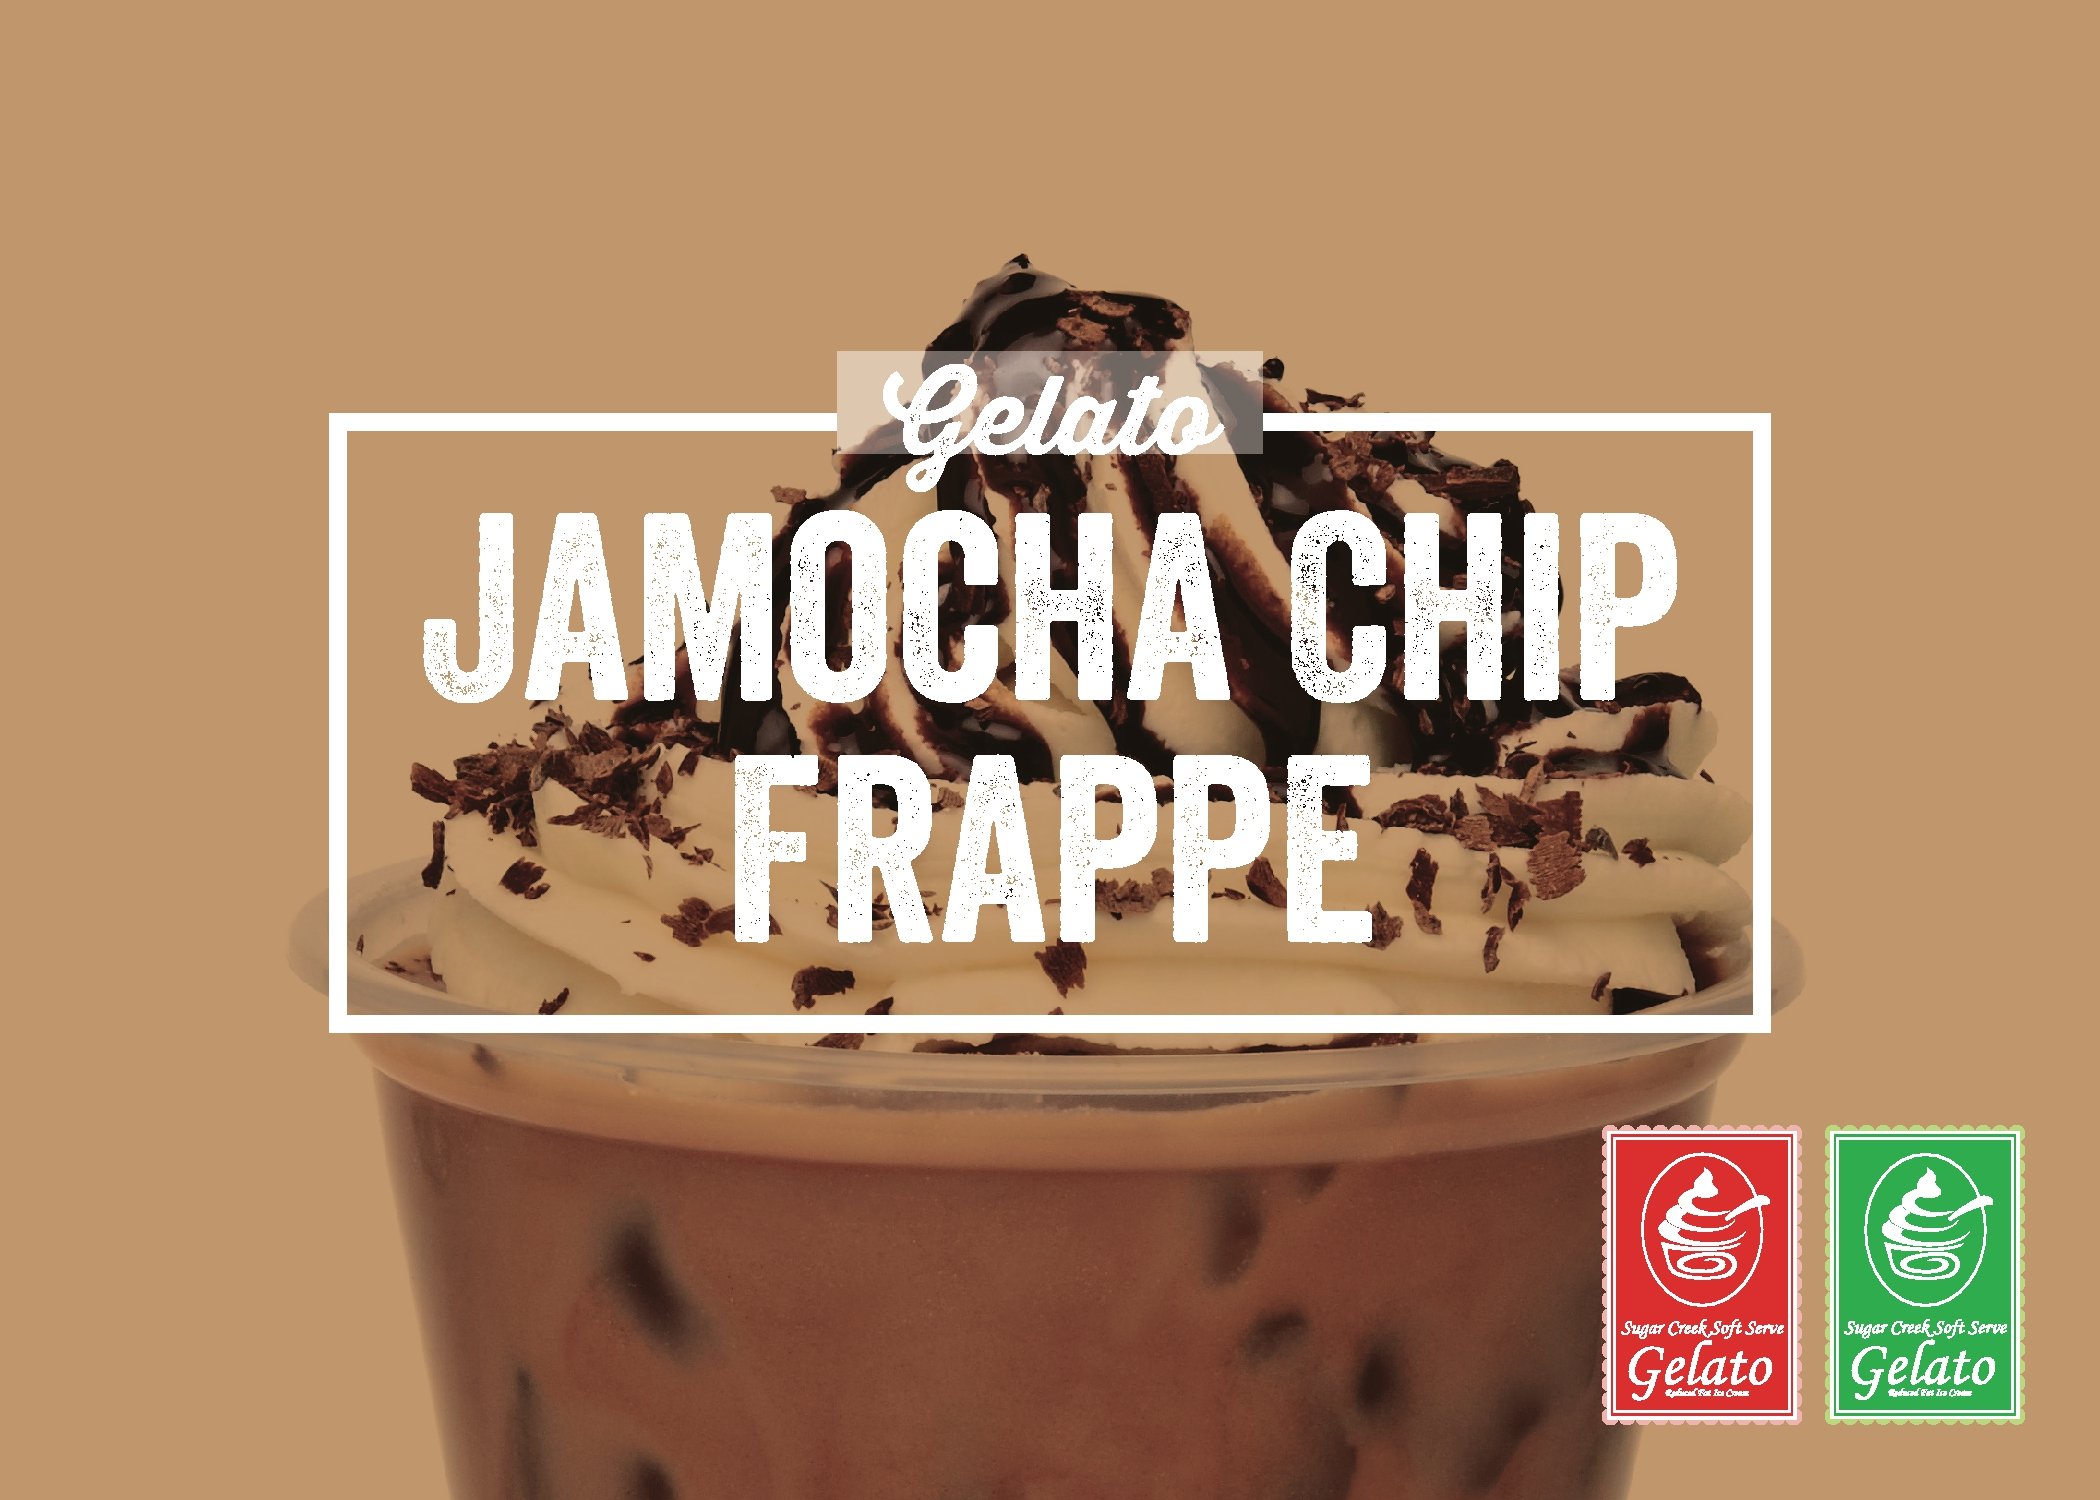 Jamocha Chip Frappe Gelato